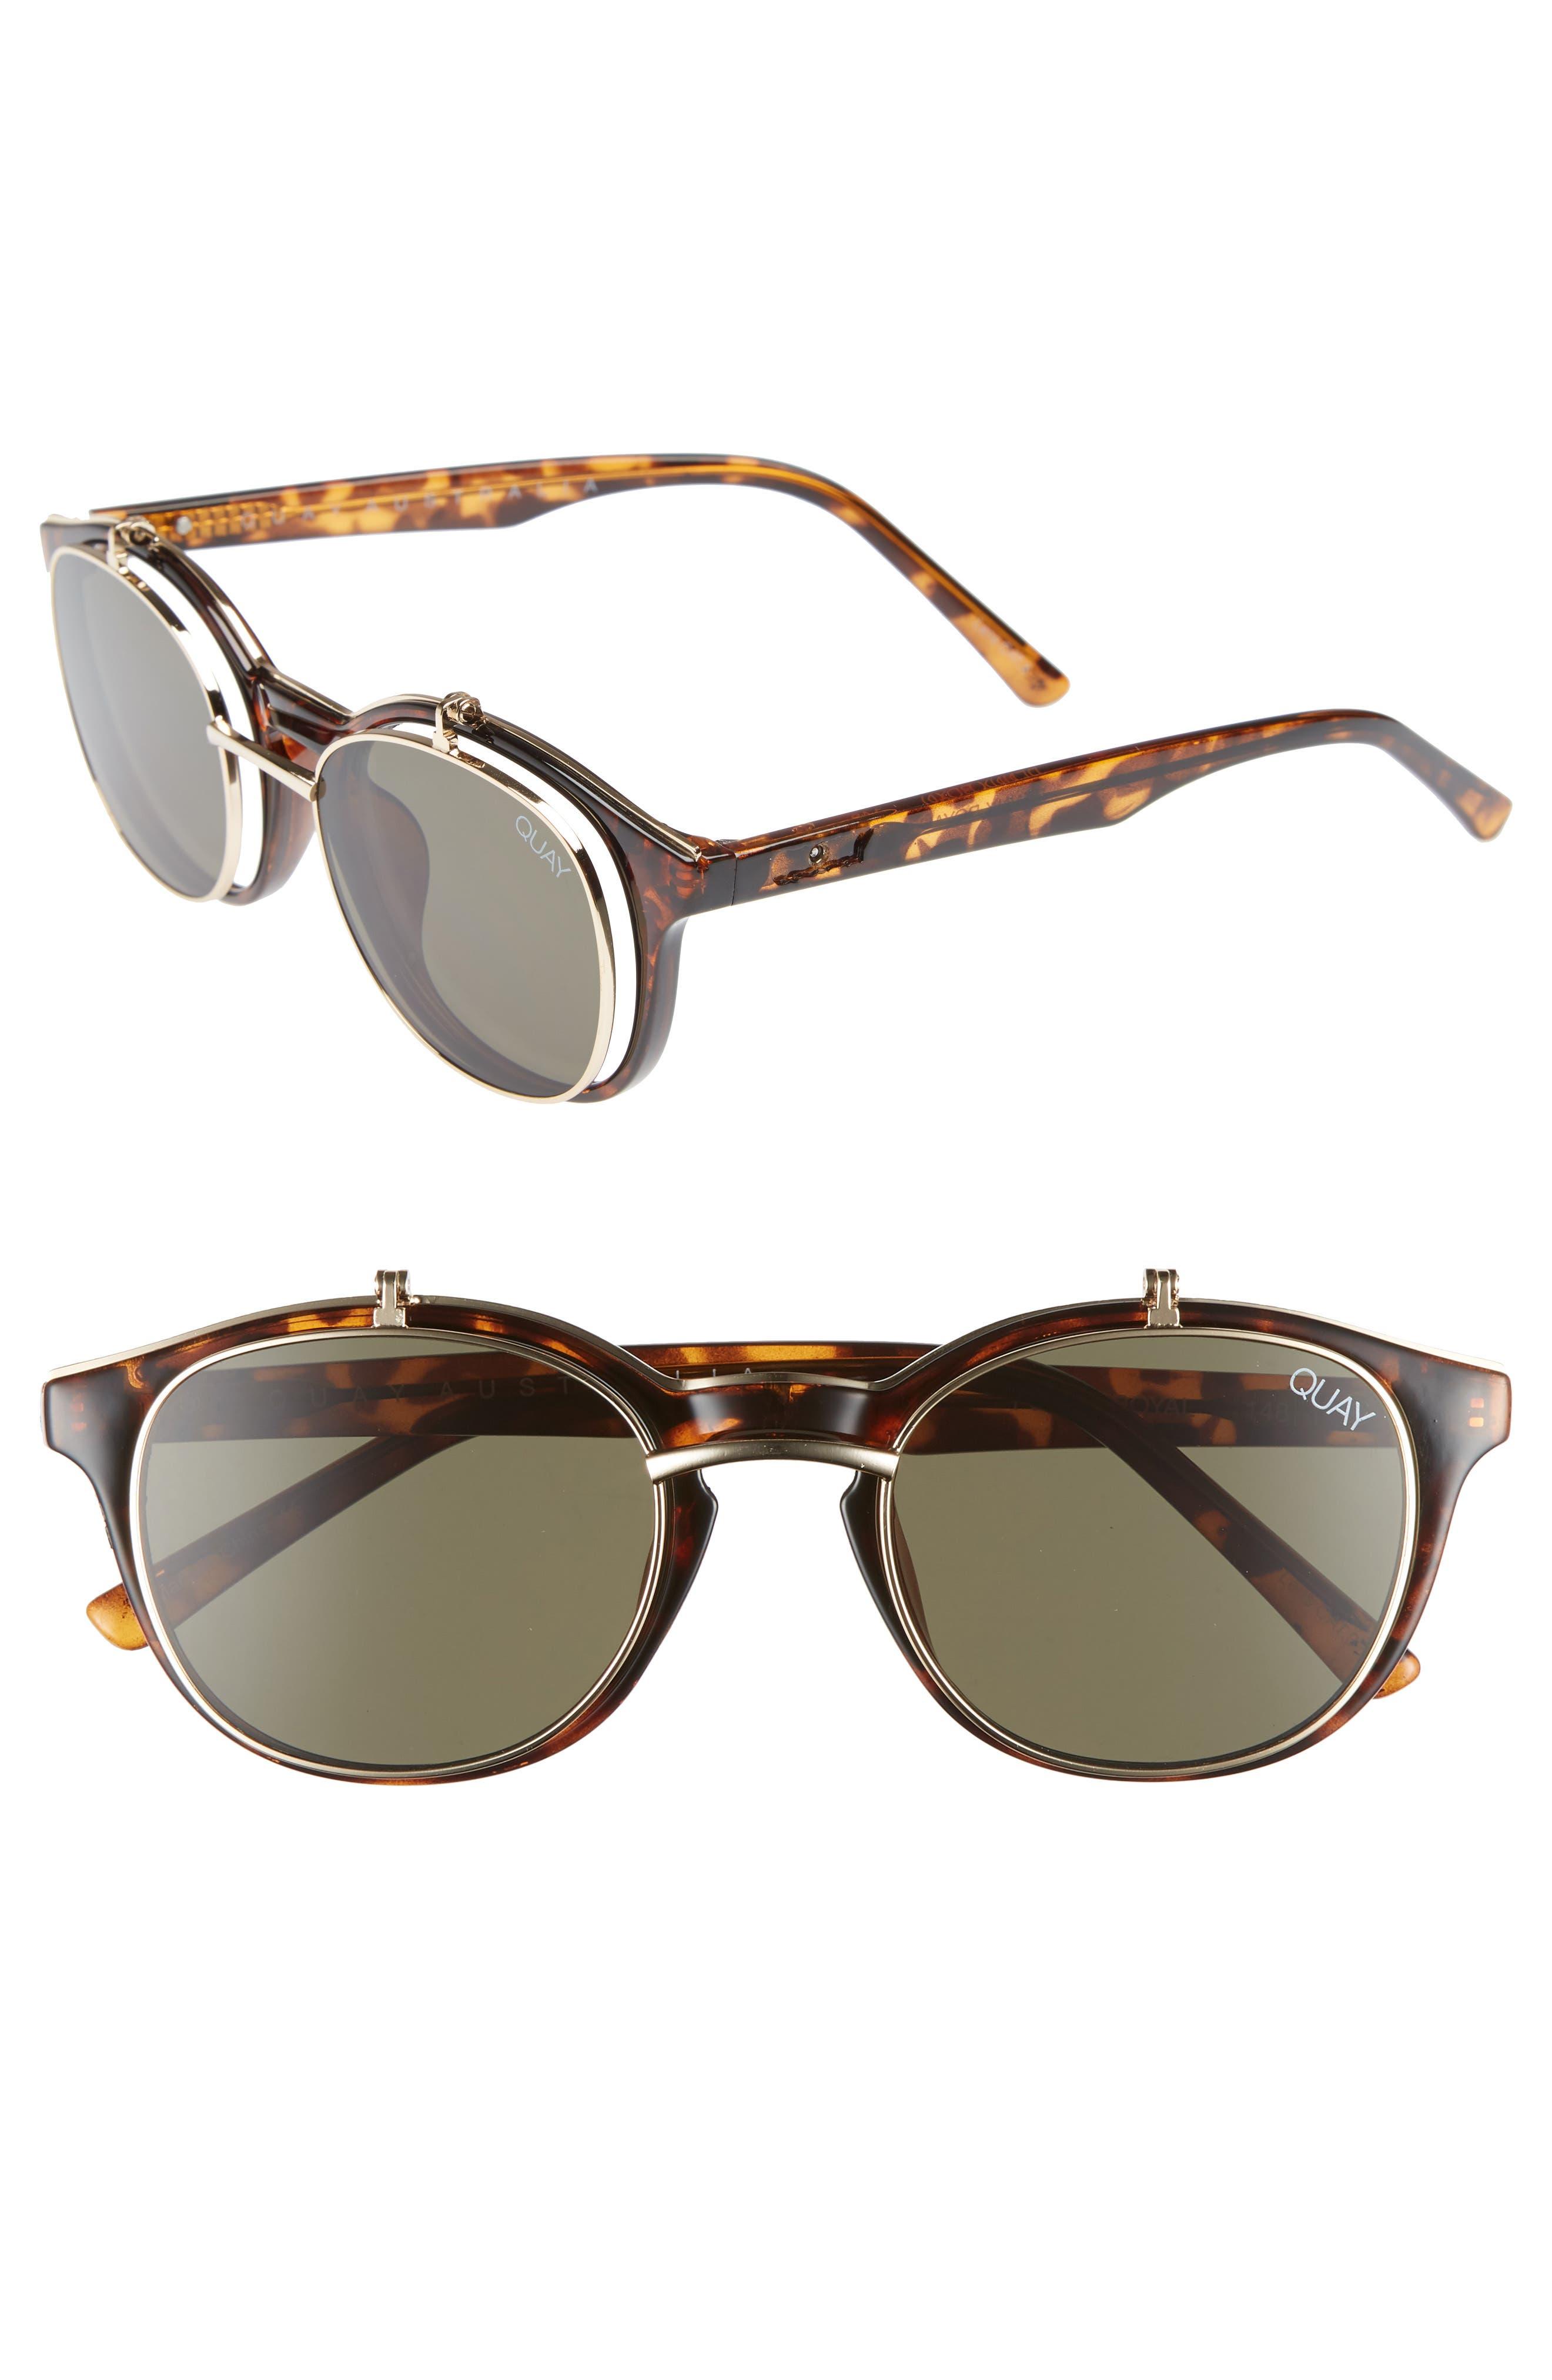 Penny Royal 55mm Flip-Up Round Sunglasses,                             Main thumbnail 1, color,                             200